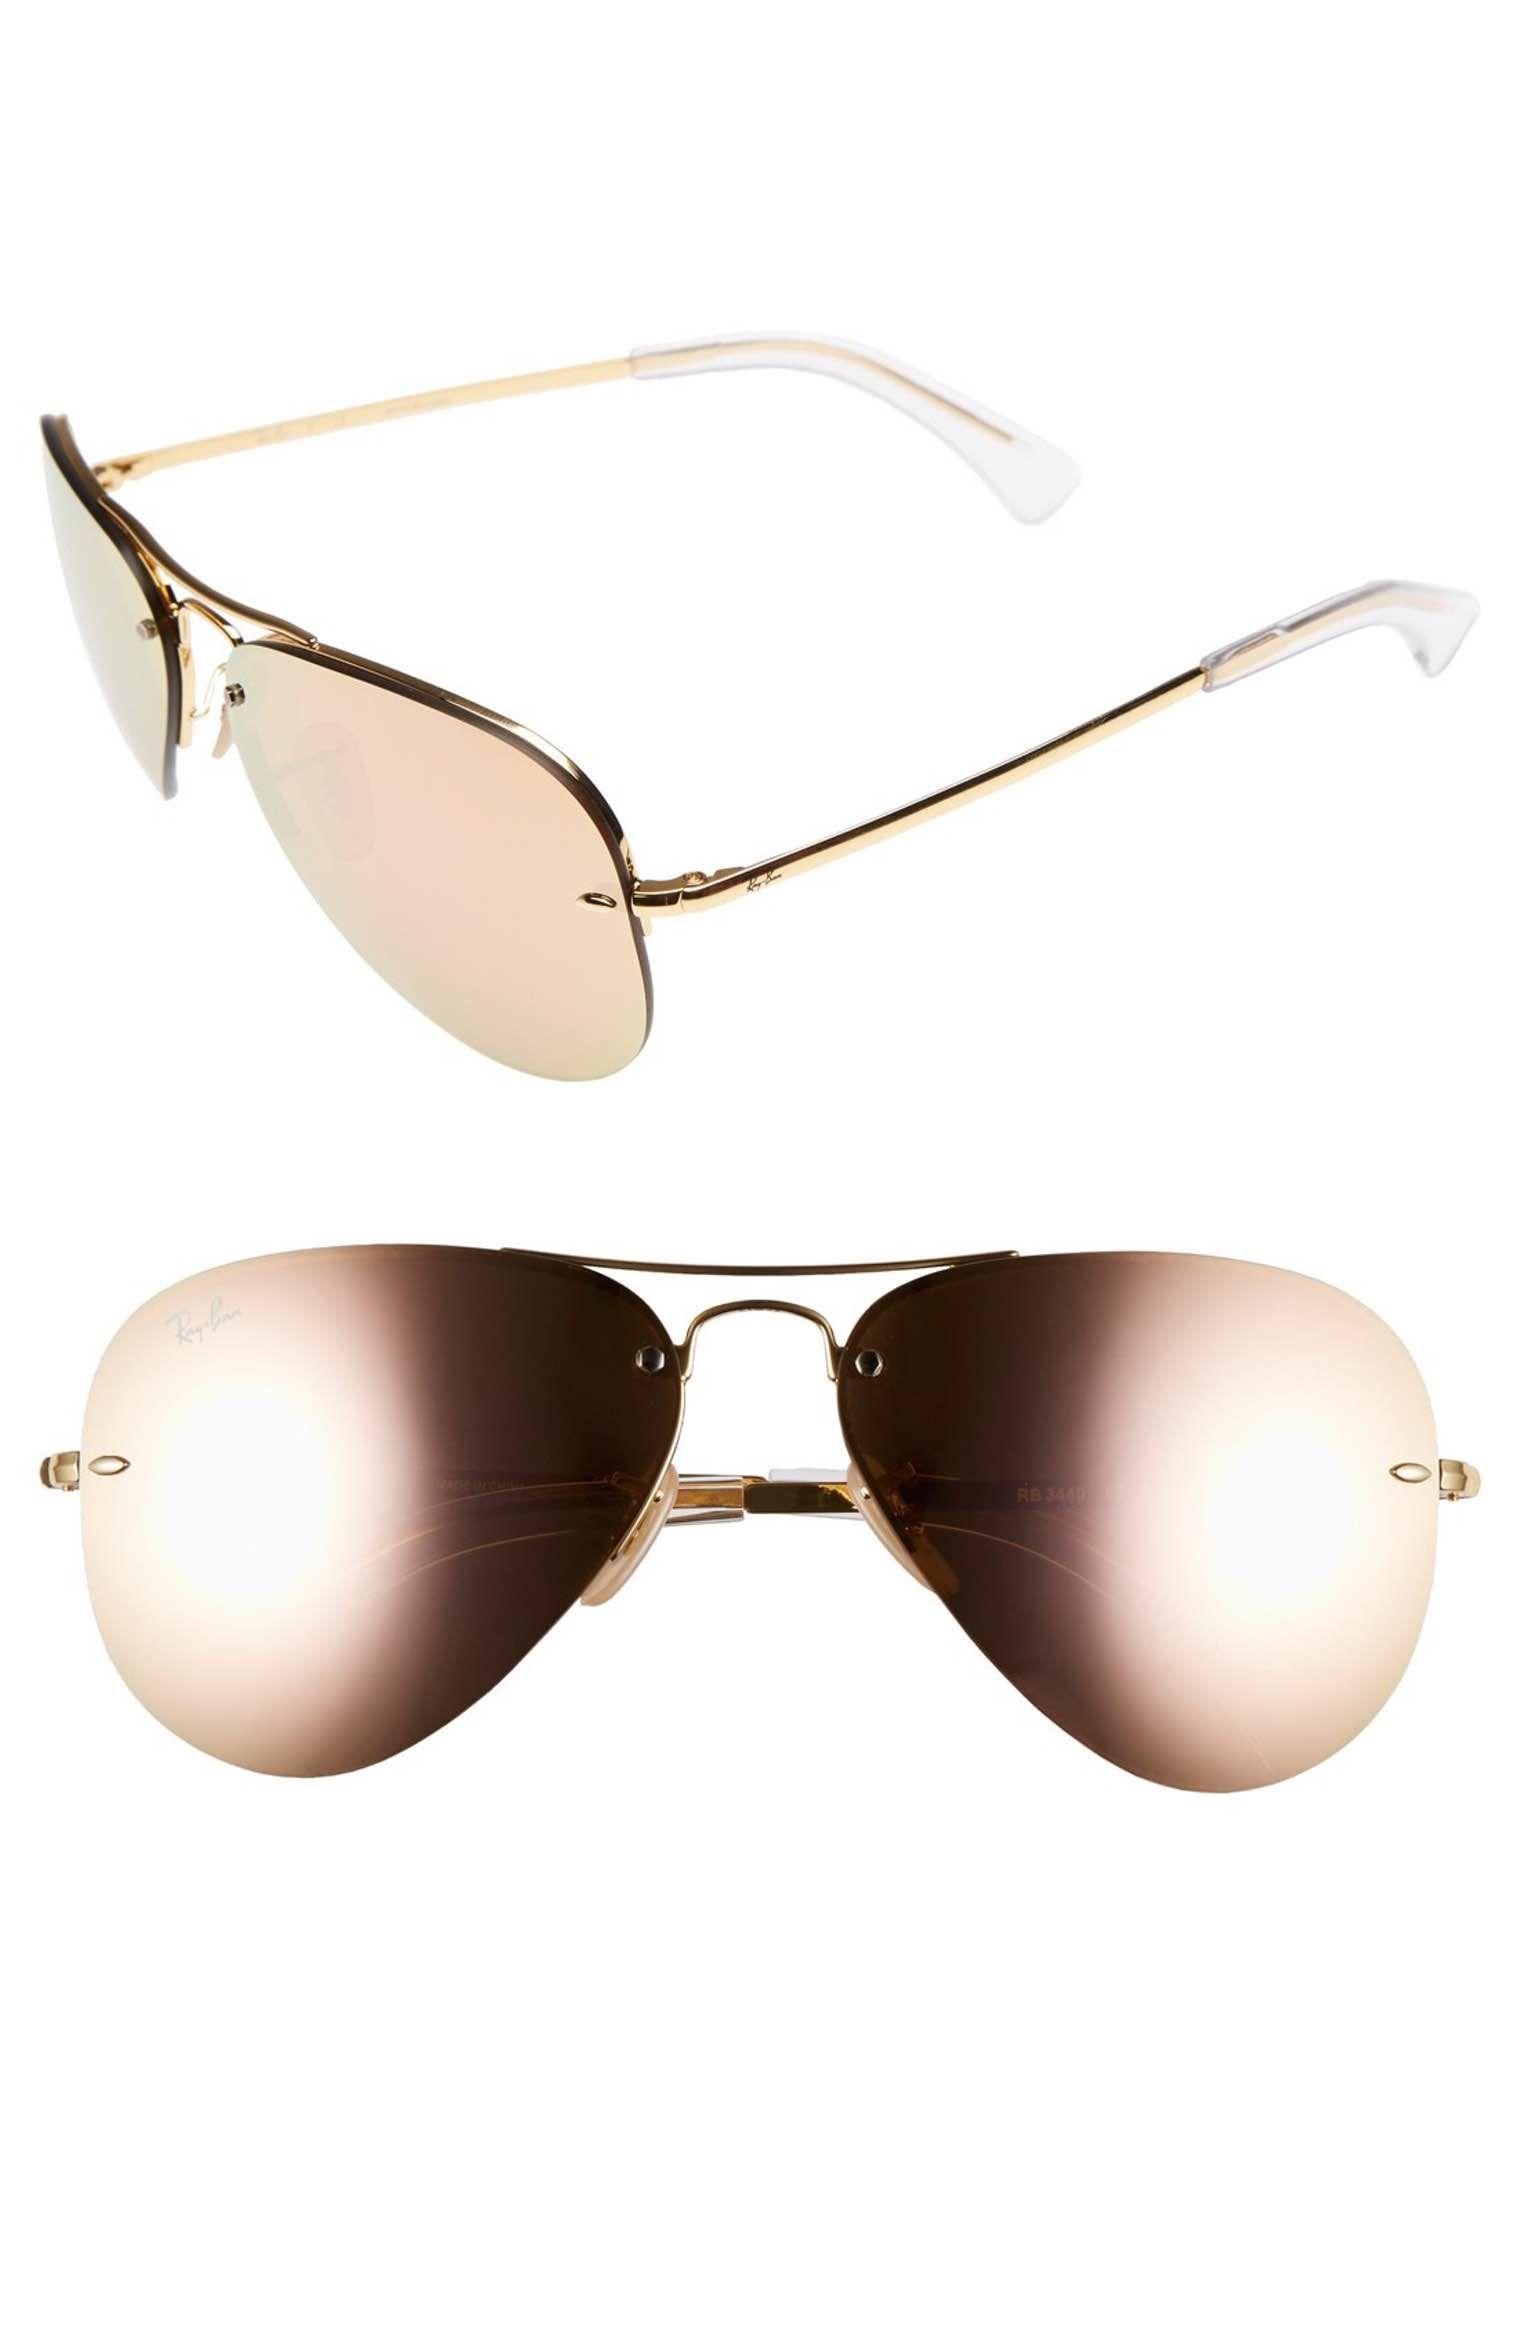 cb097a2f7393 Main Image - Ray-Ban 59mm Semi Rimless Aviator Sunglasses | clothing ...